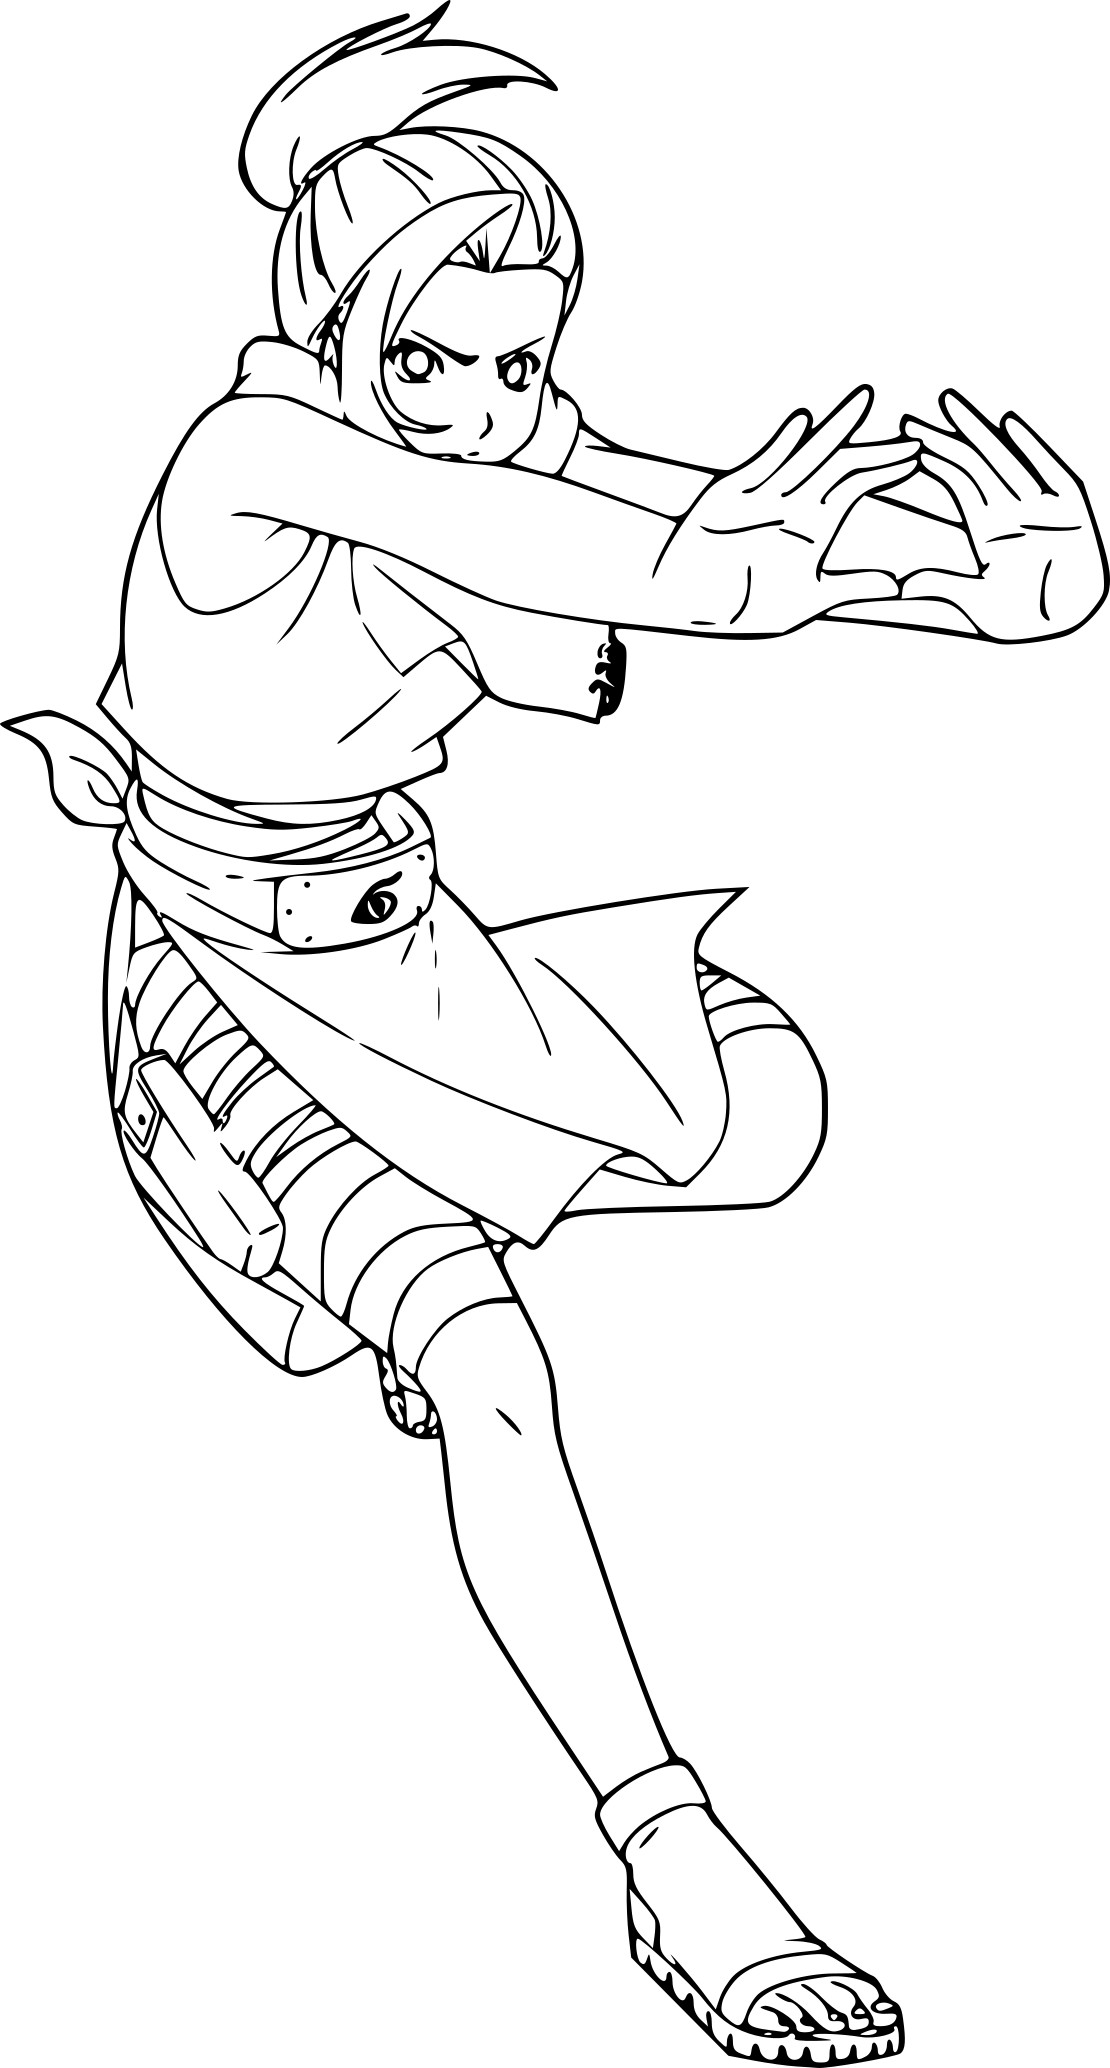 Coloriage Naruto fille